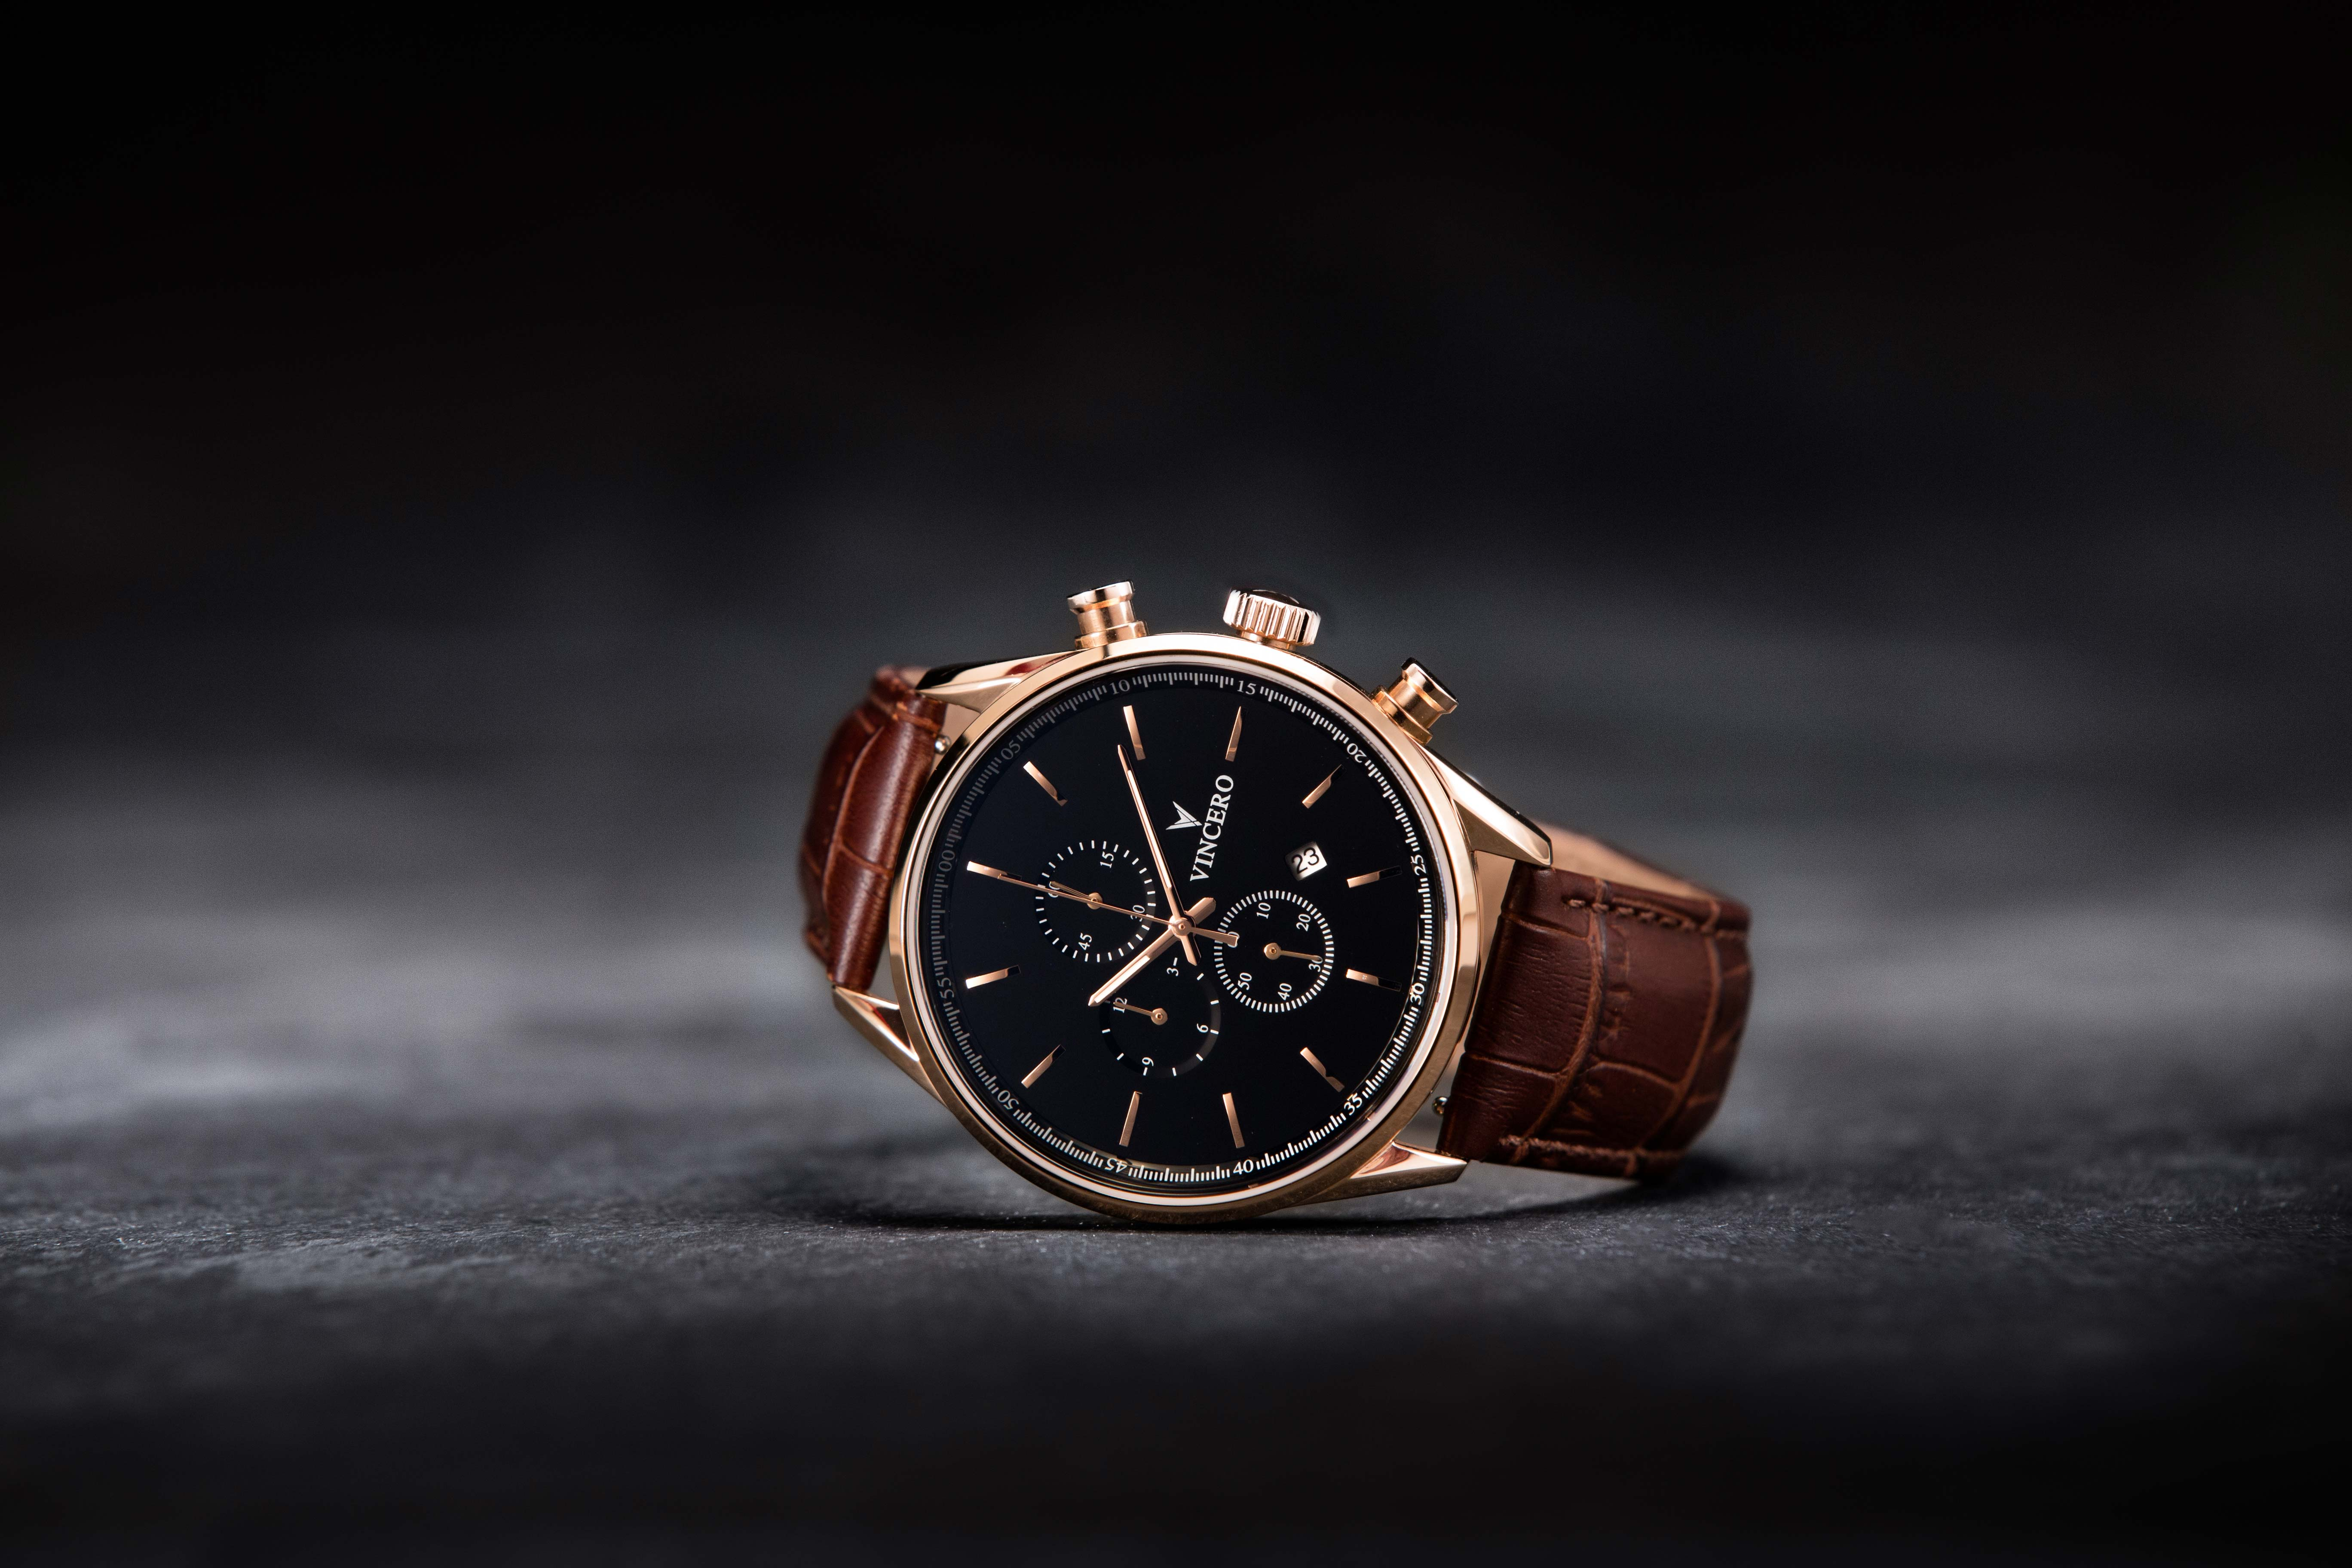 vincero men's watches